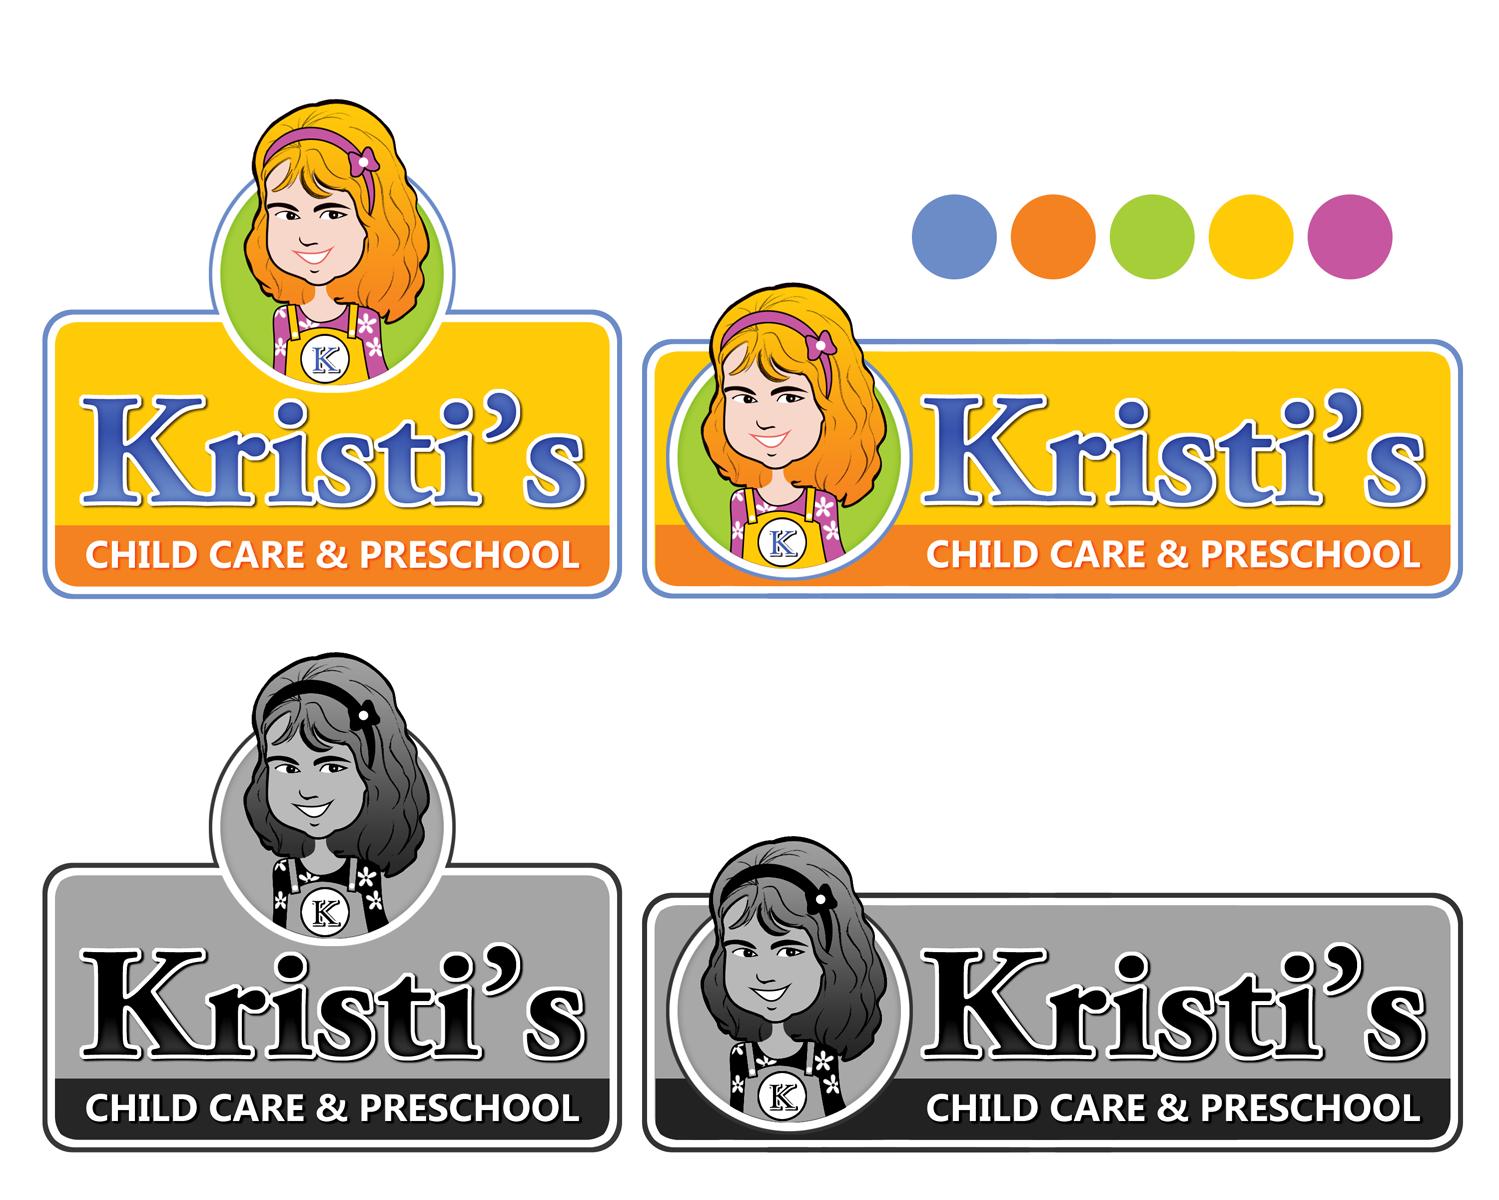 logo for Kristi's